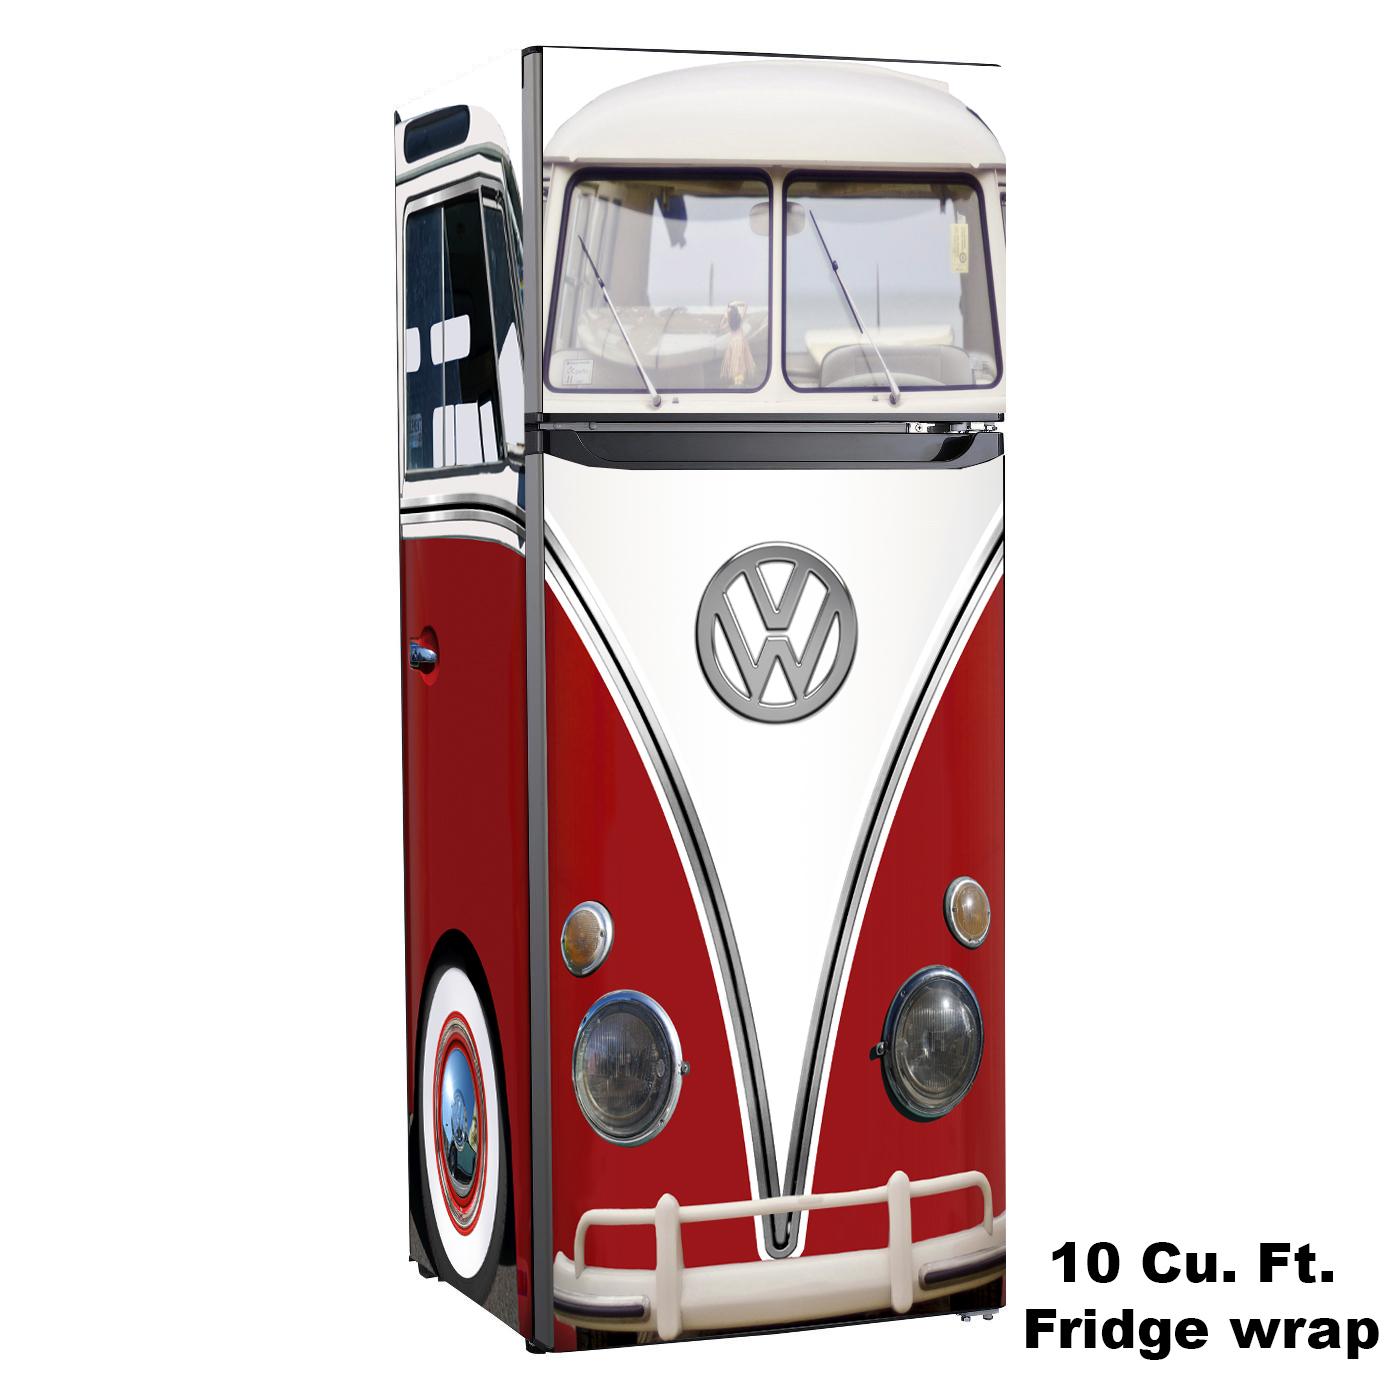 Vw Bus, 10 cu. ft. Fridge, Design Skin, rm wraps, vw red bus